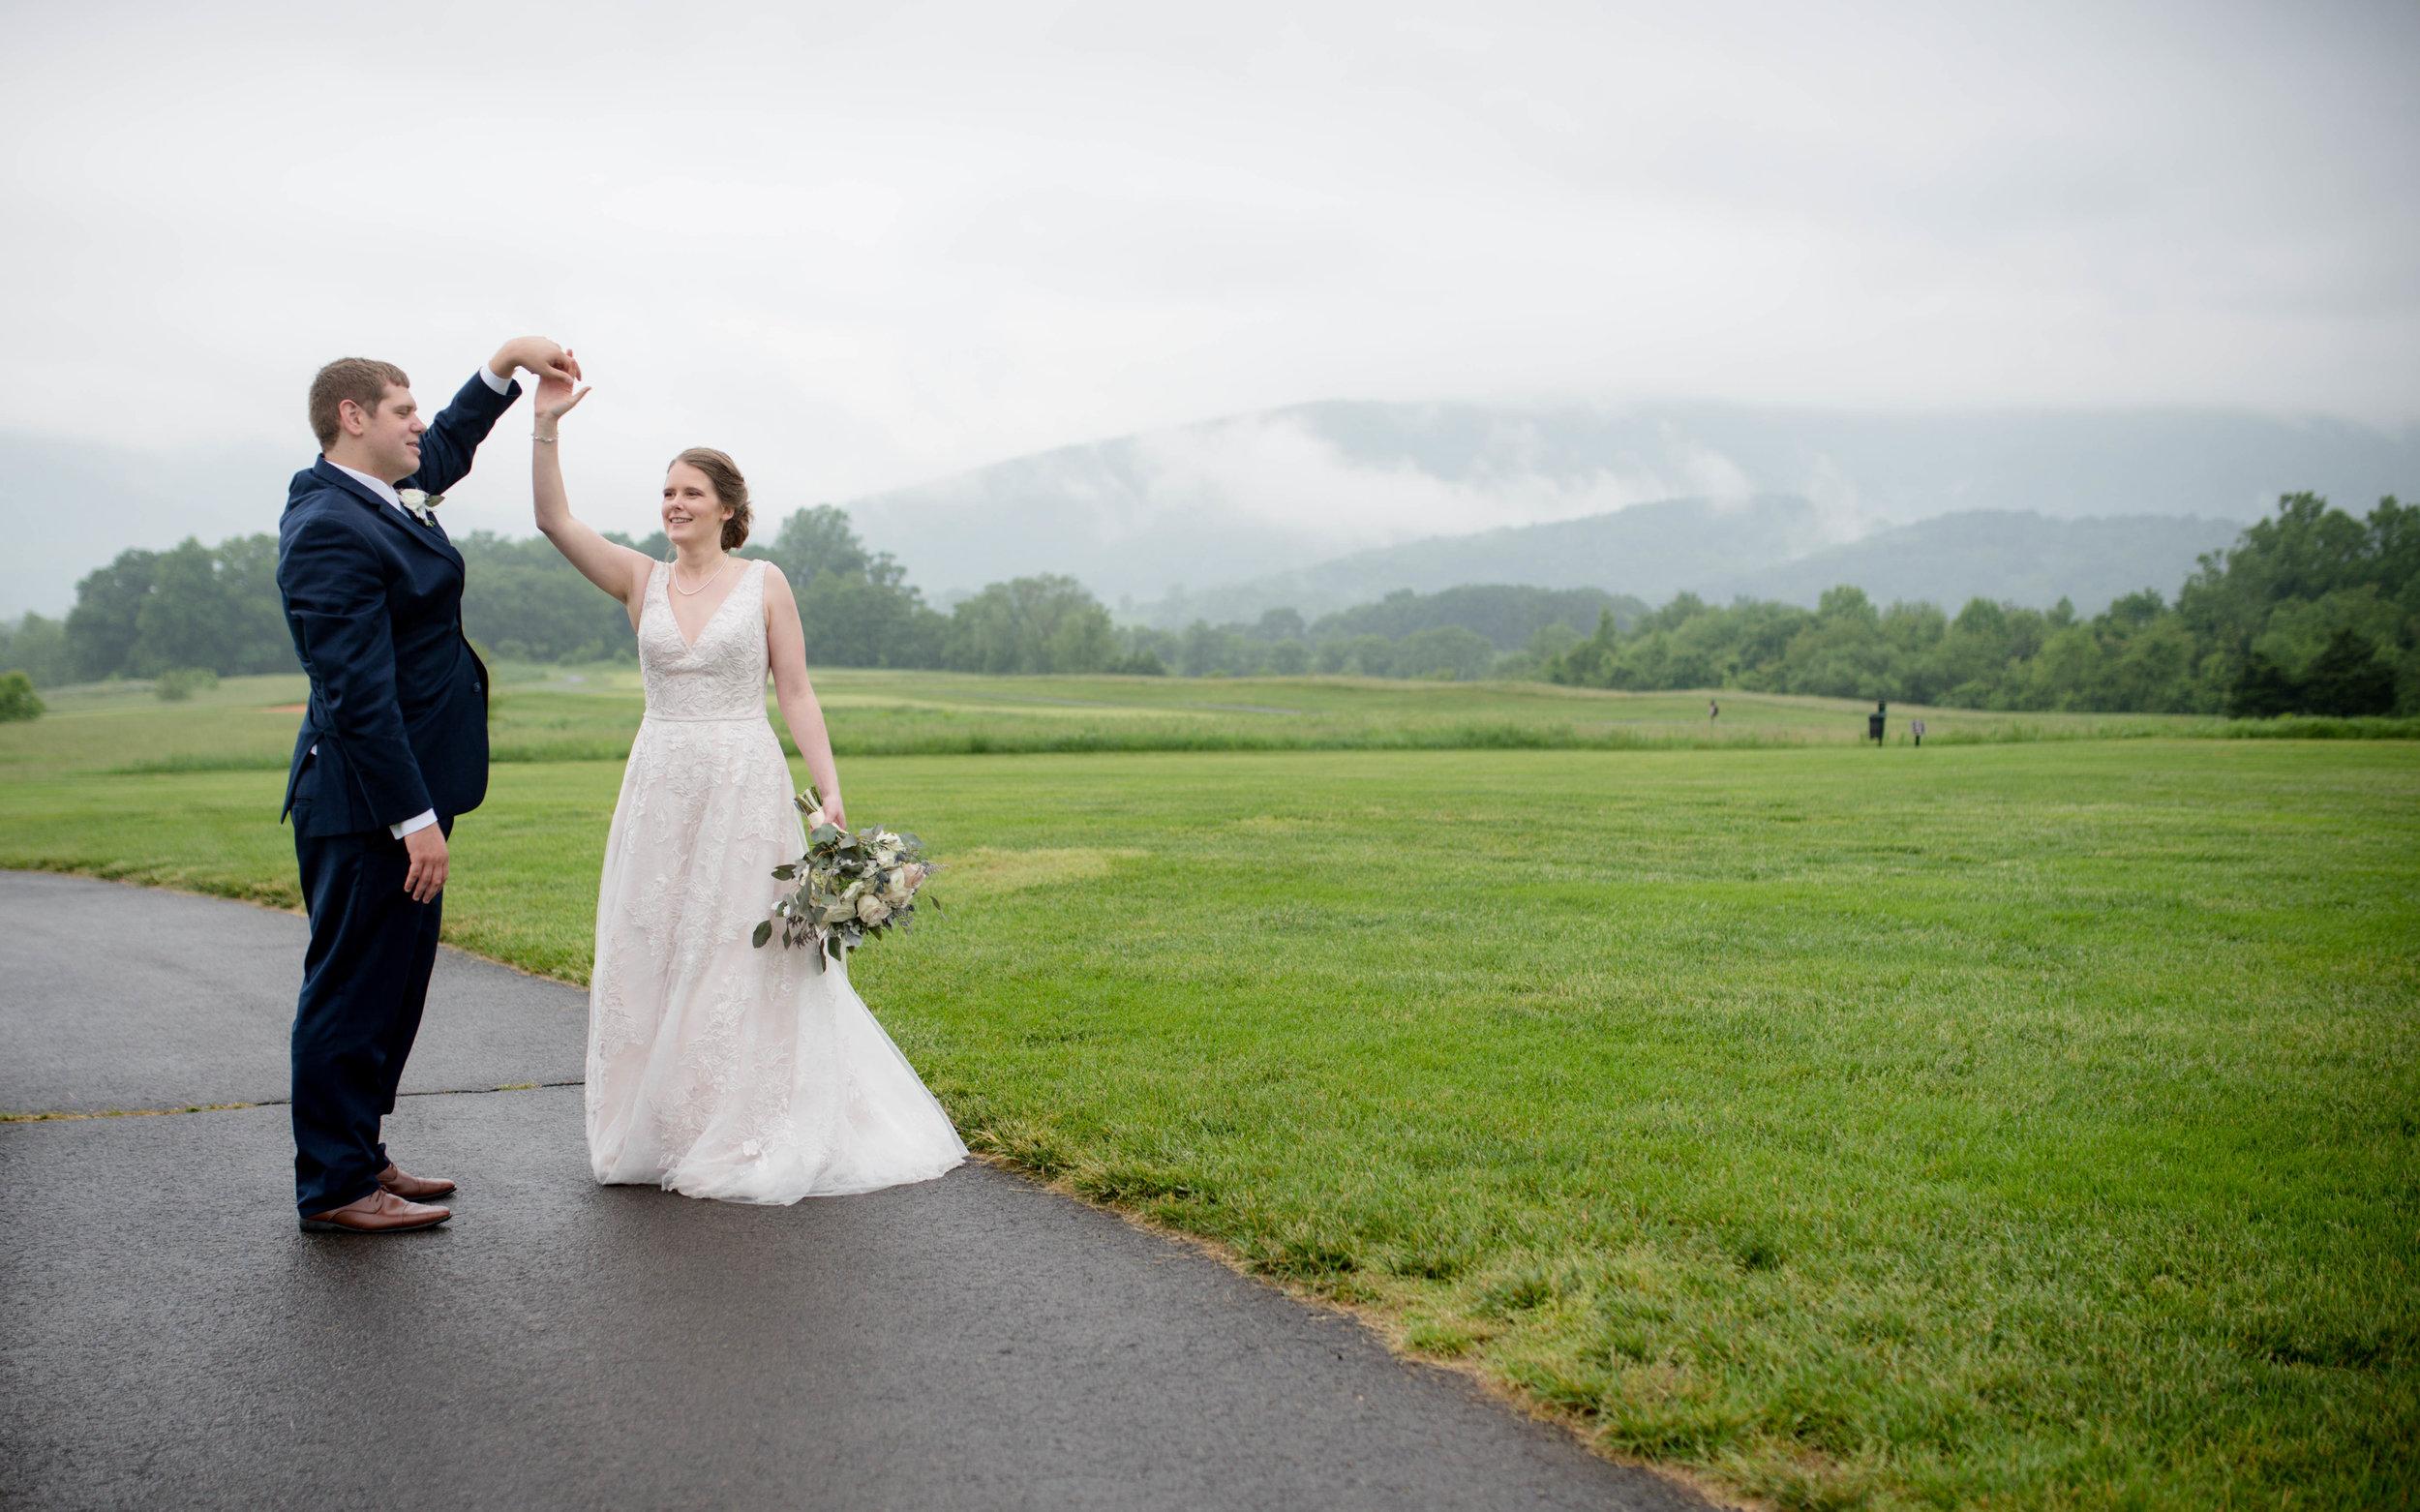 blue-ridge-wedding-ashley-nicole-photography-restoration-hall-crozetphotography-restorationhall-charlottesville-weddingB+G-2.jpg